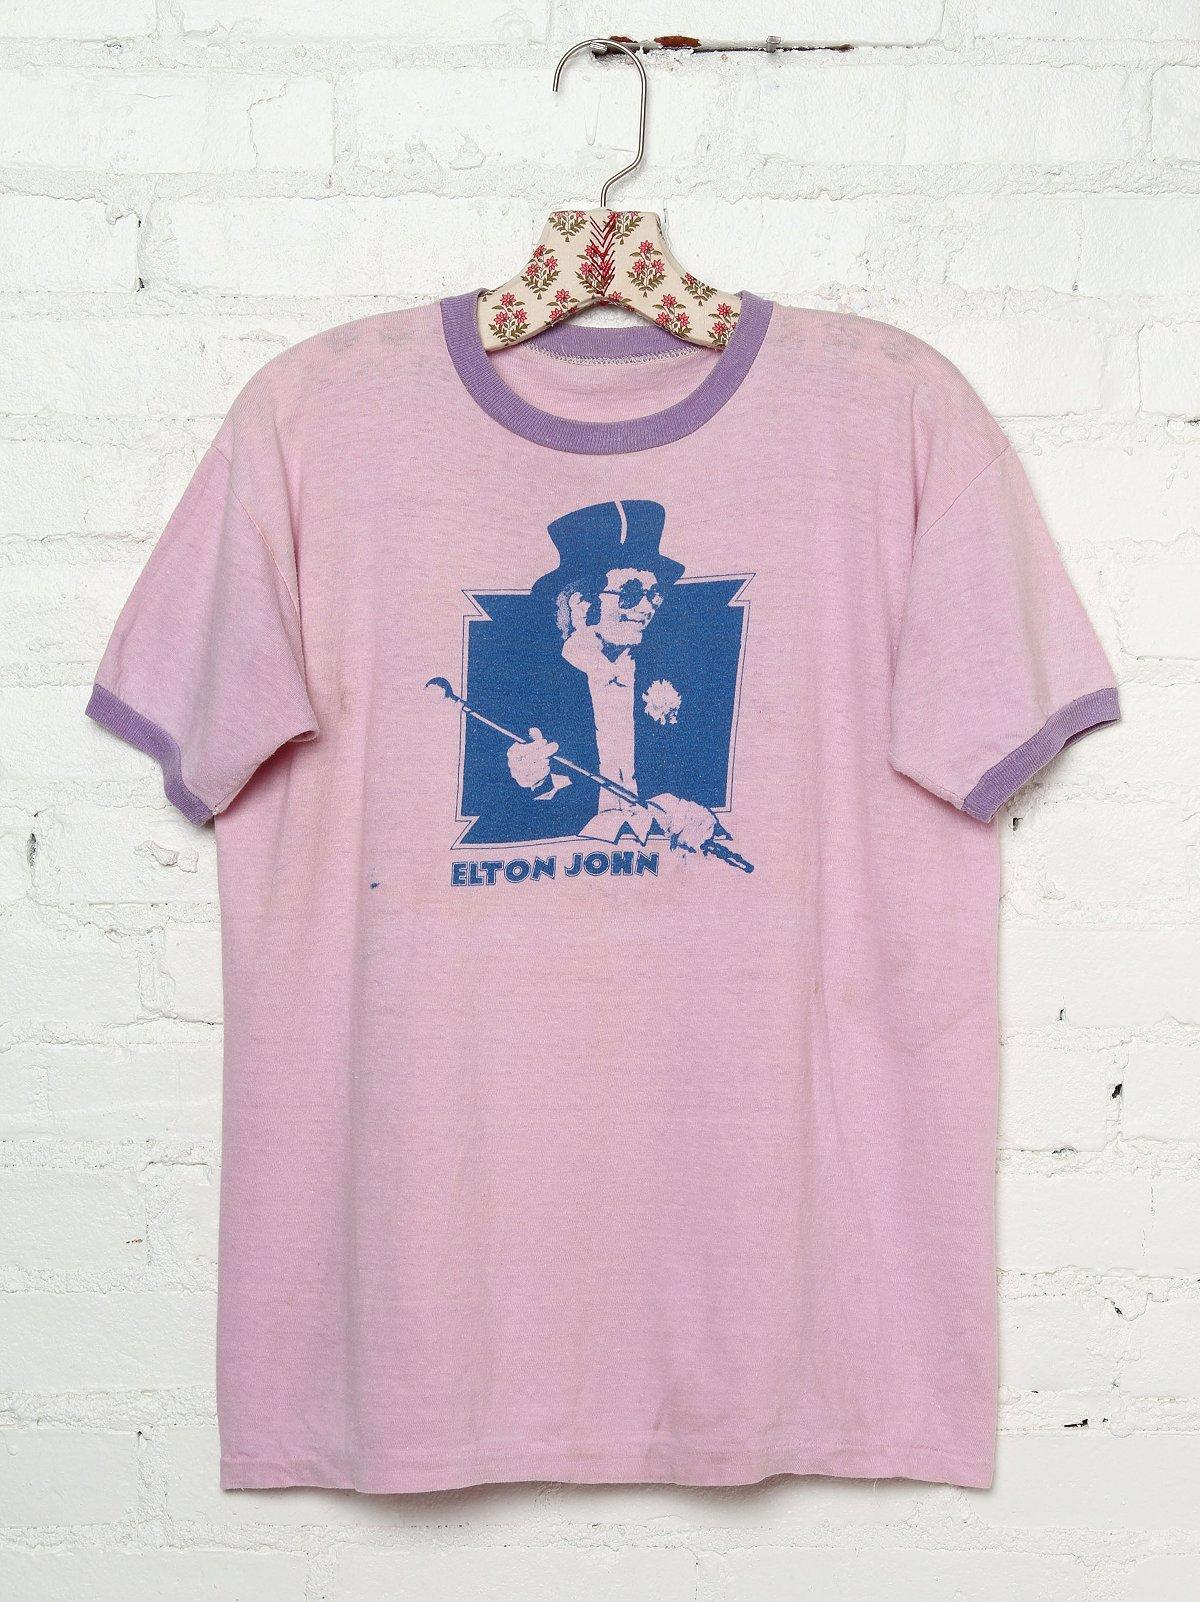 Vintage Elton John Tee